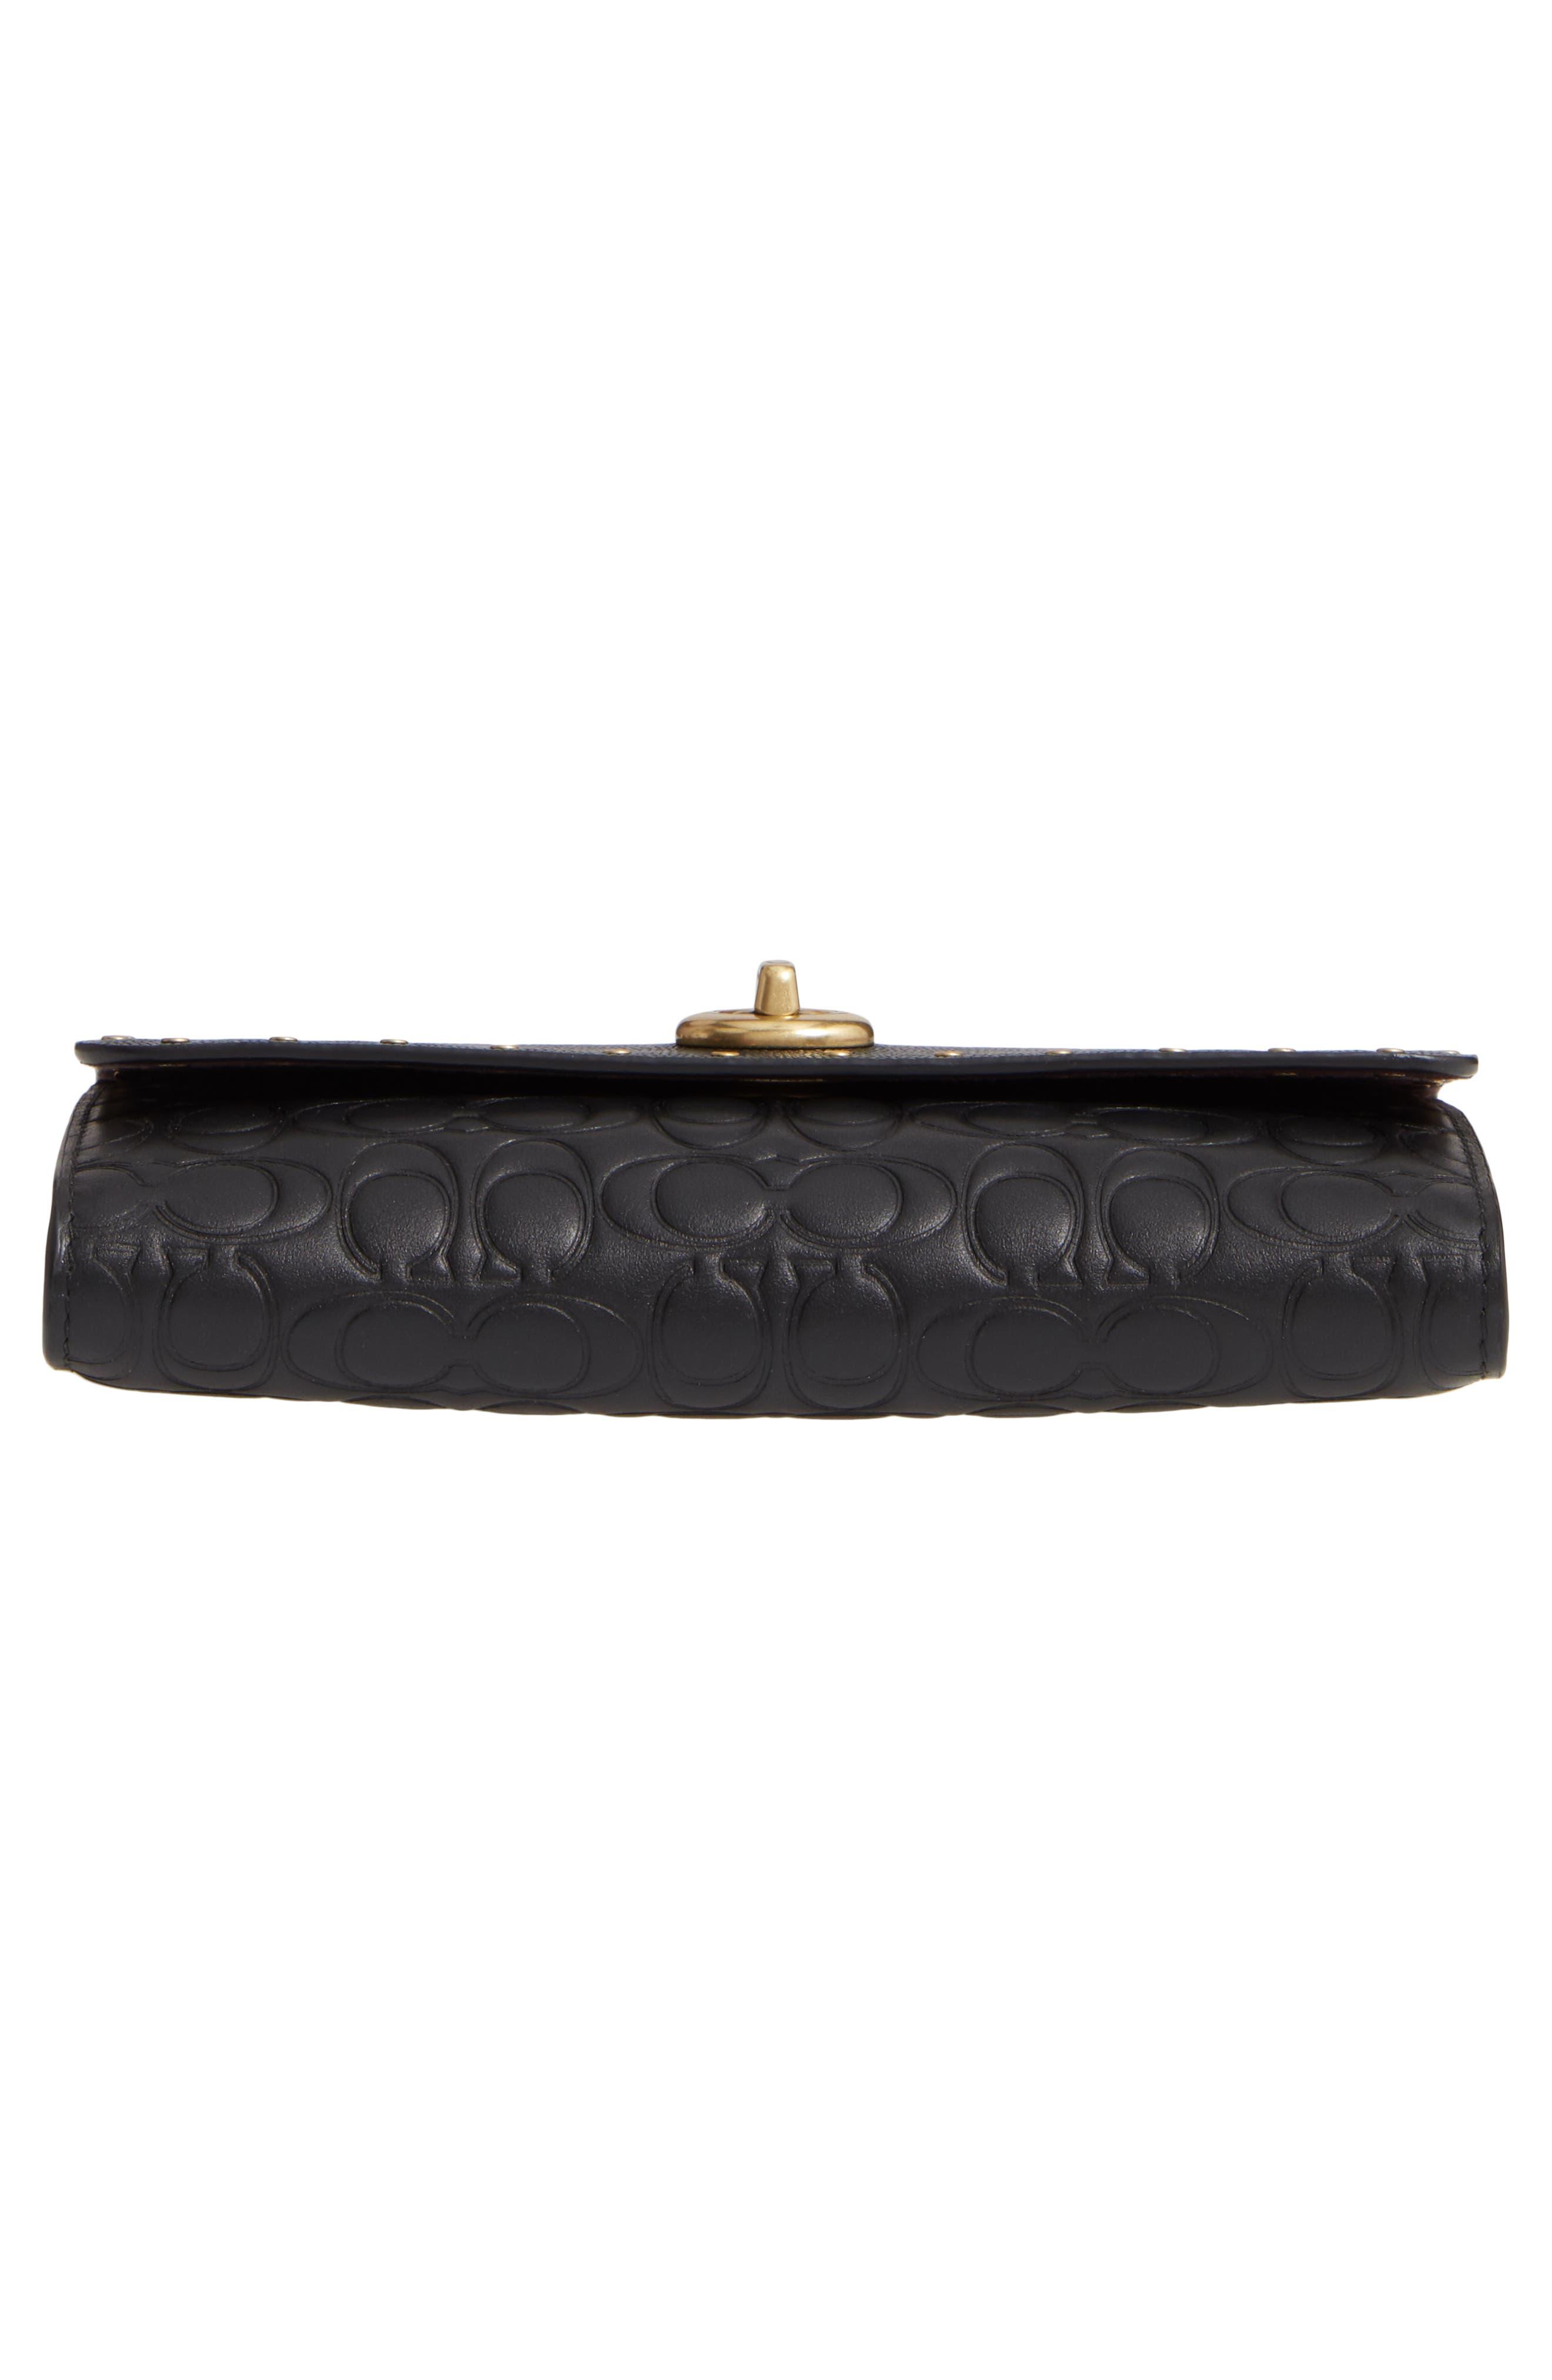 COACH, Marlow Rivets Leather Crossbody Bag, Alternate thumbnail 7, color, BLACK